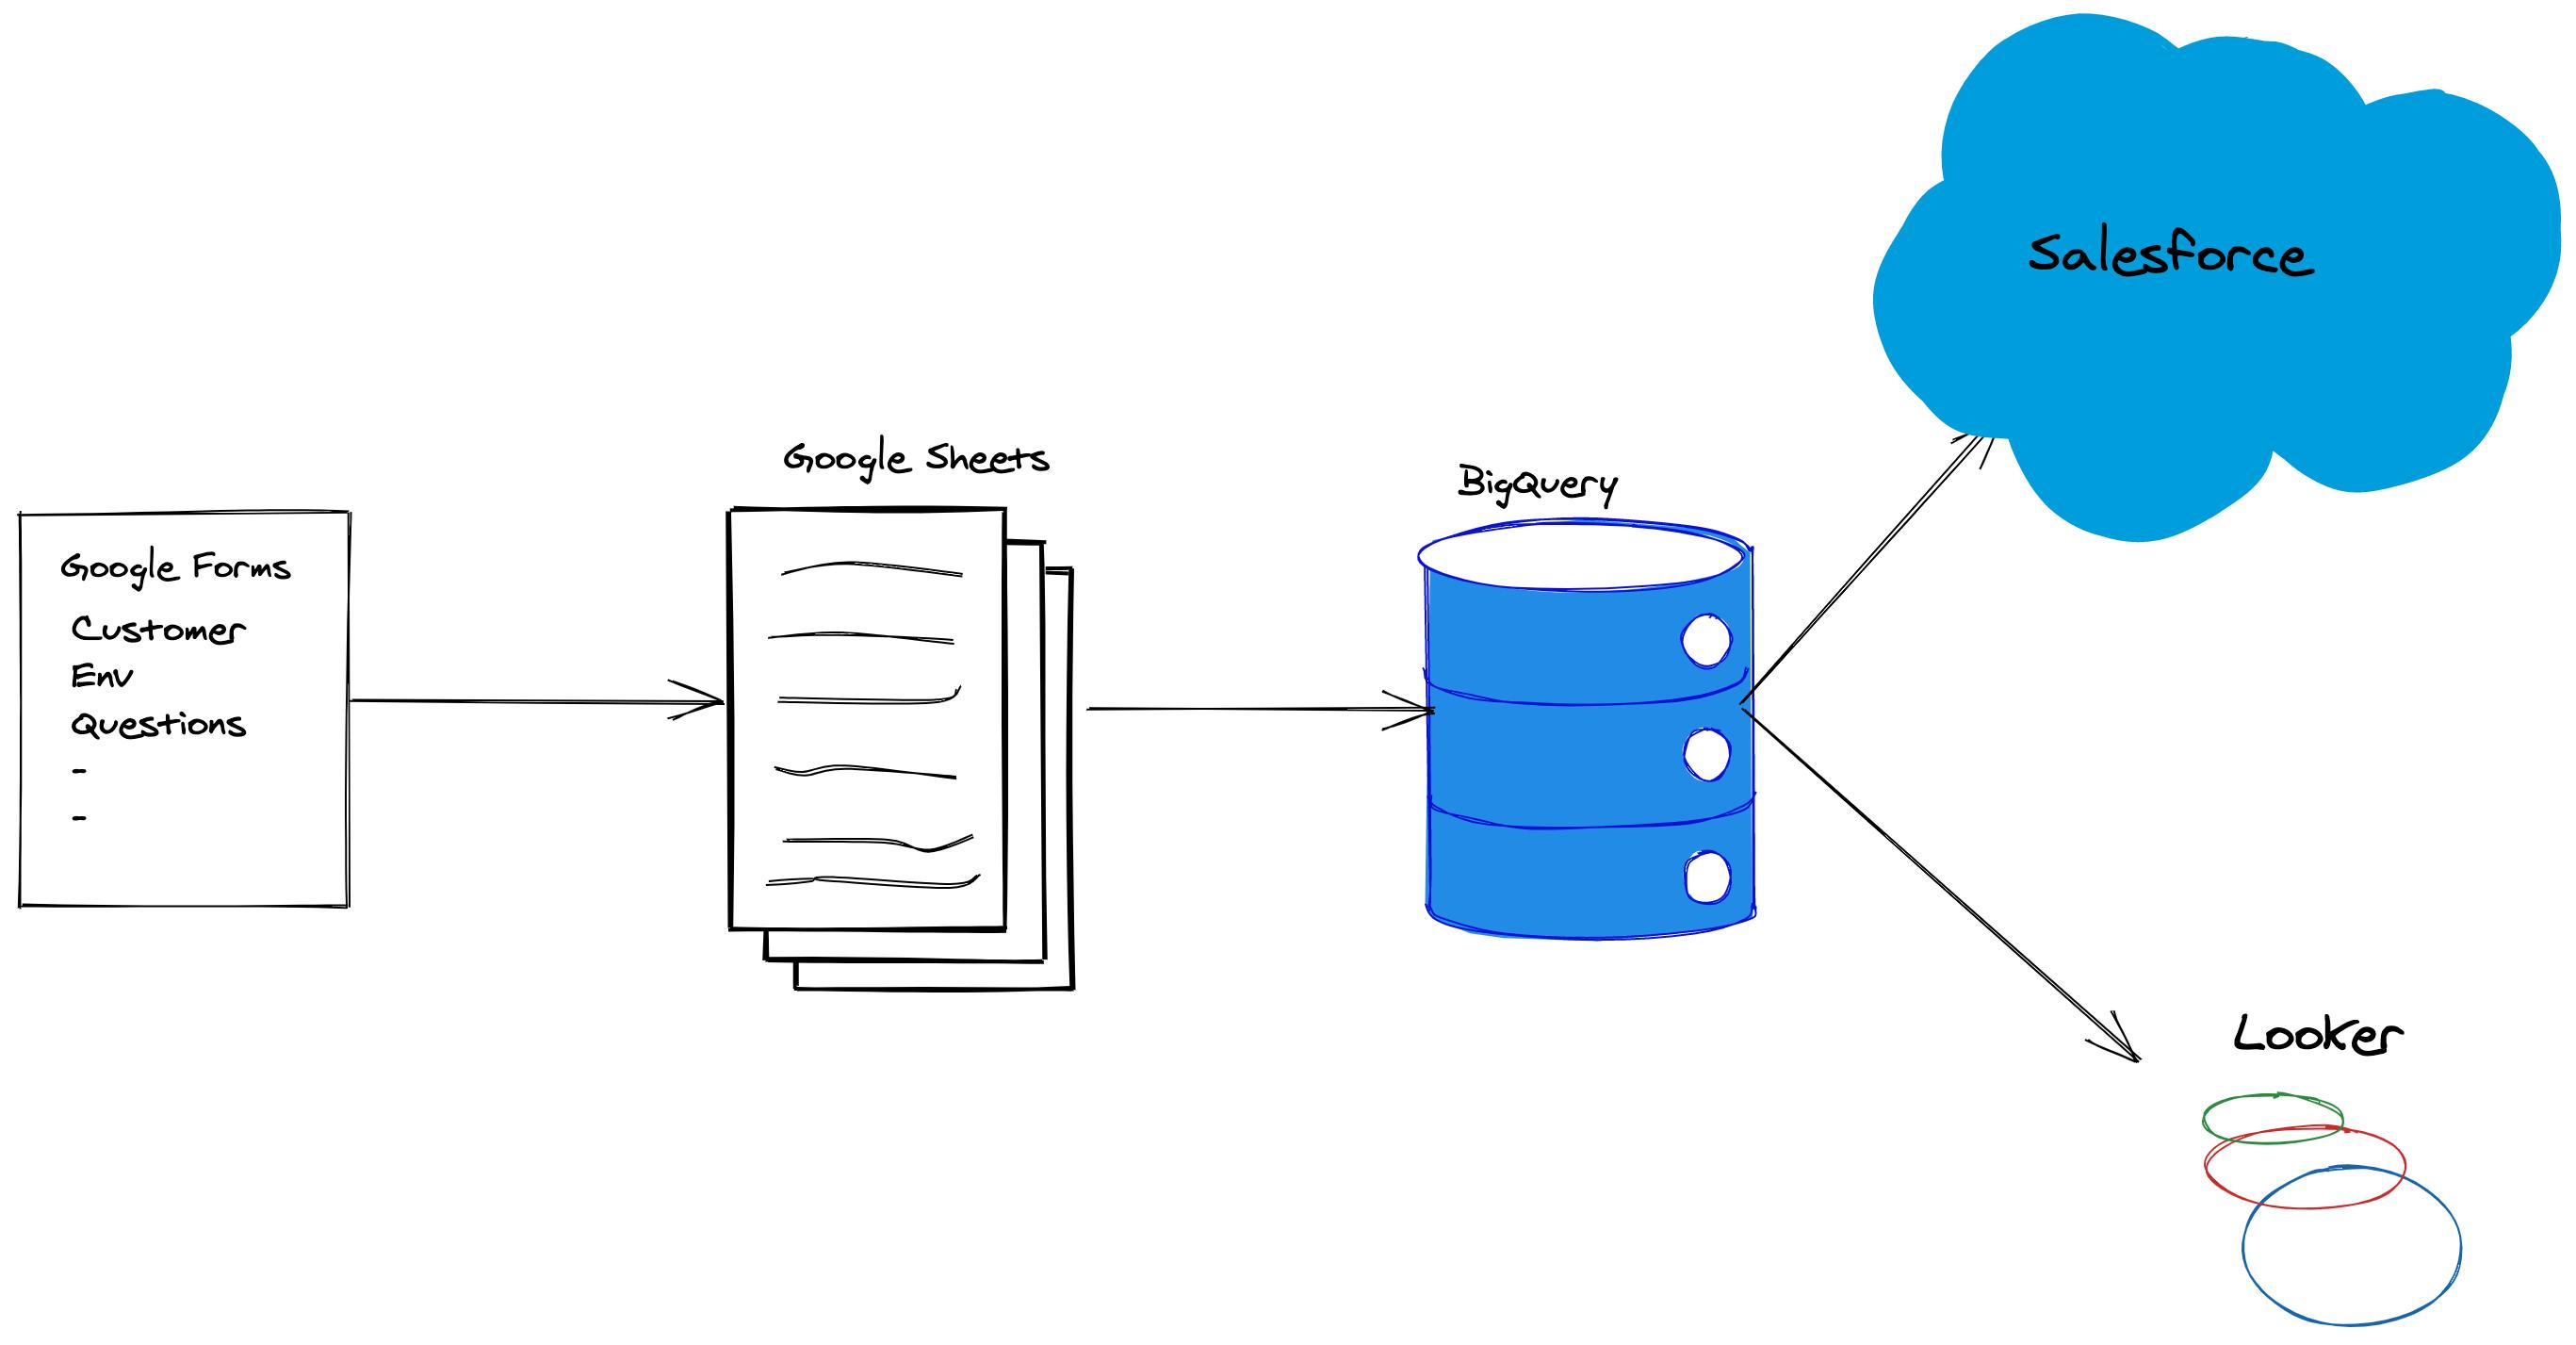 Image of customer data pipeline